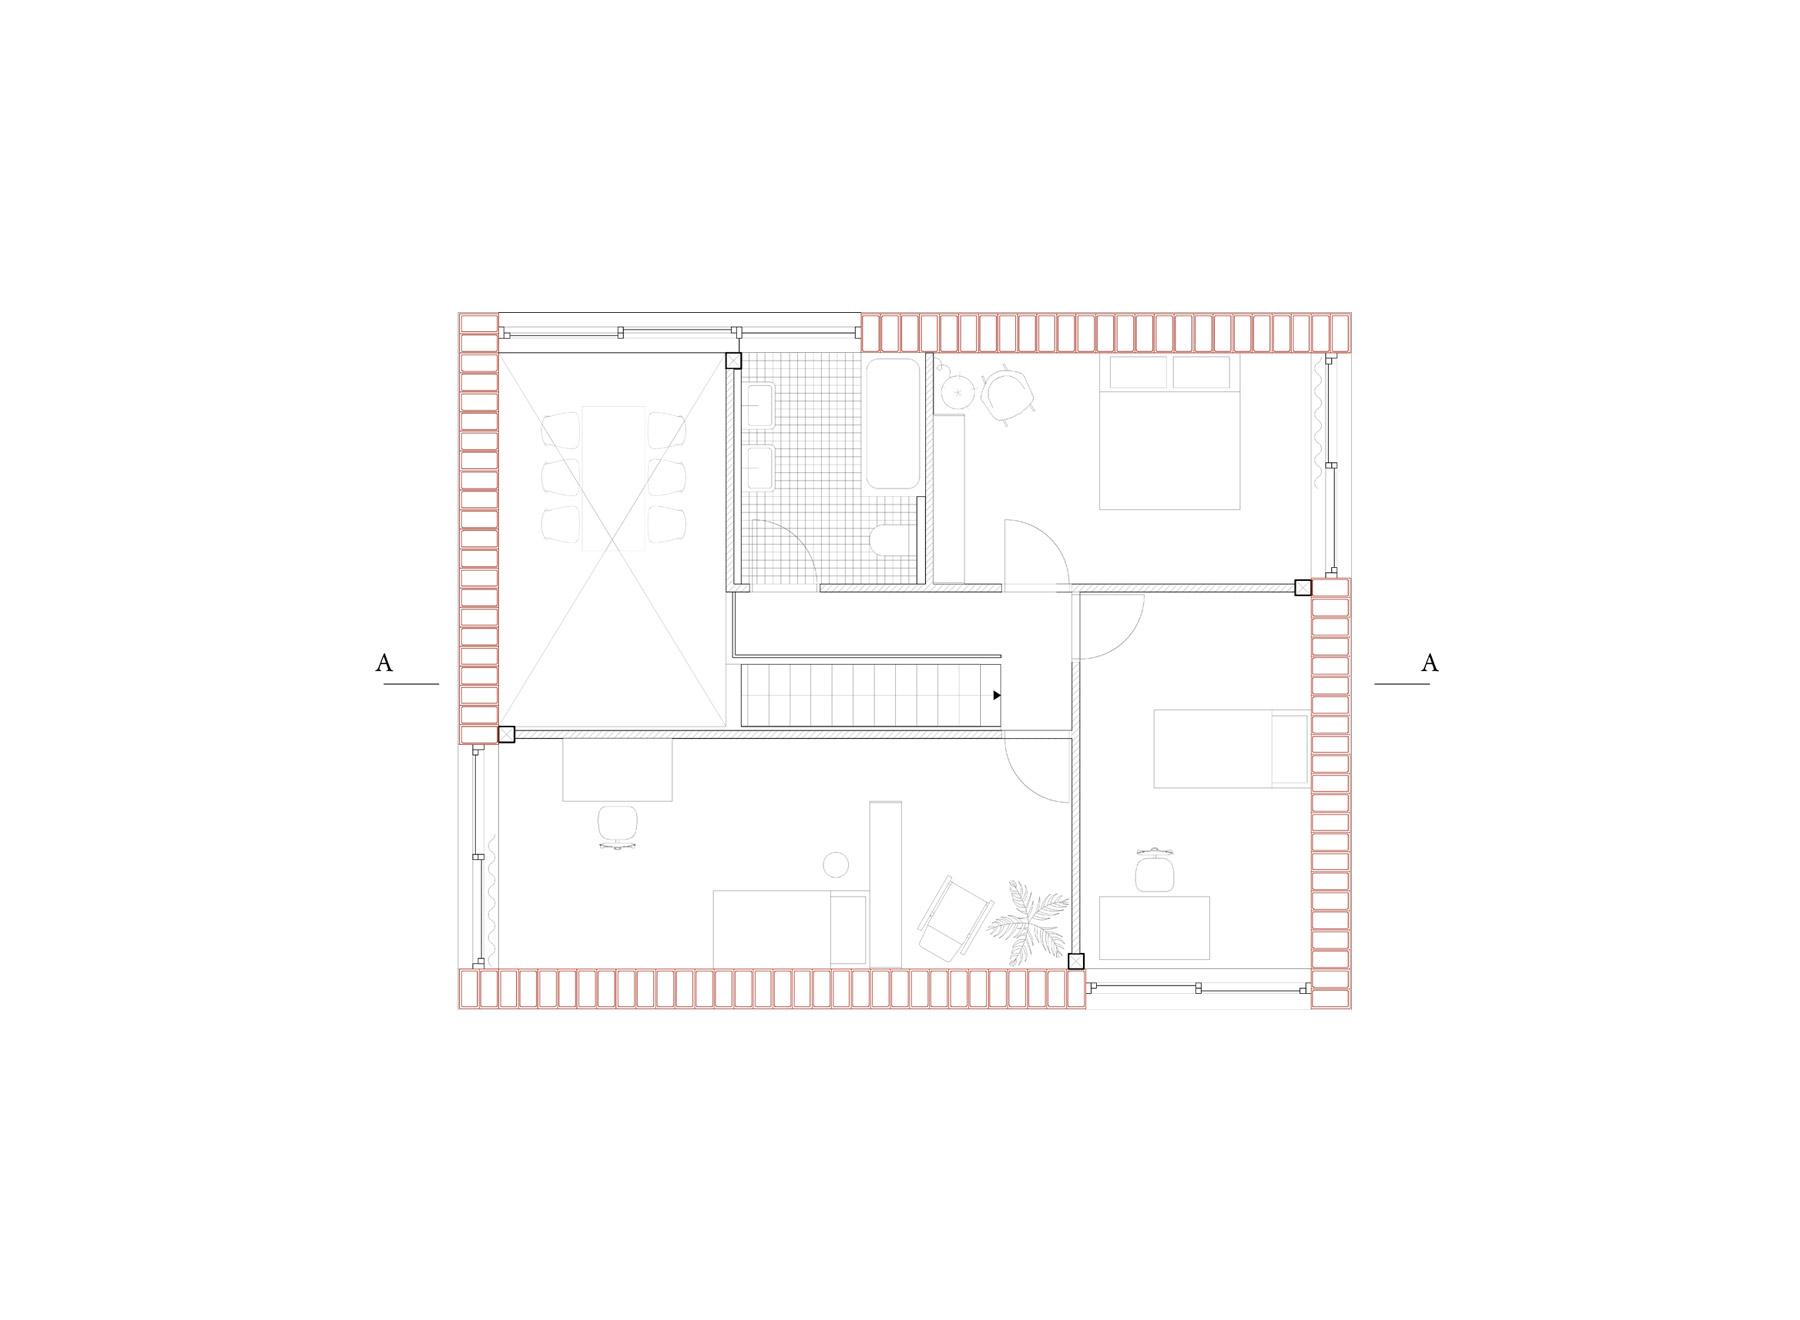 7/8 house, upper floor